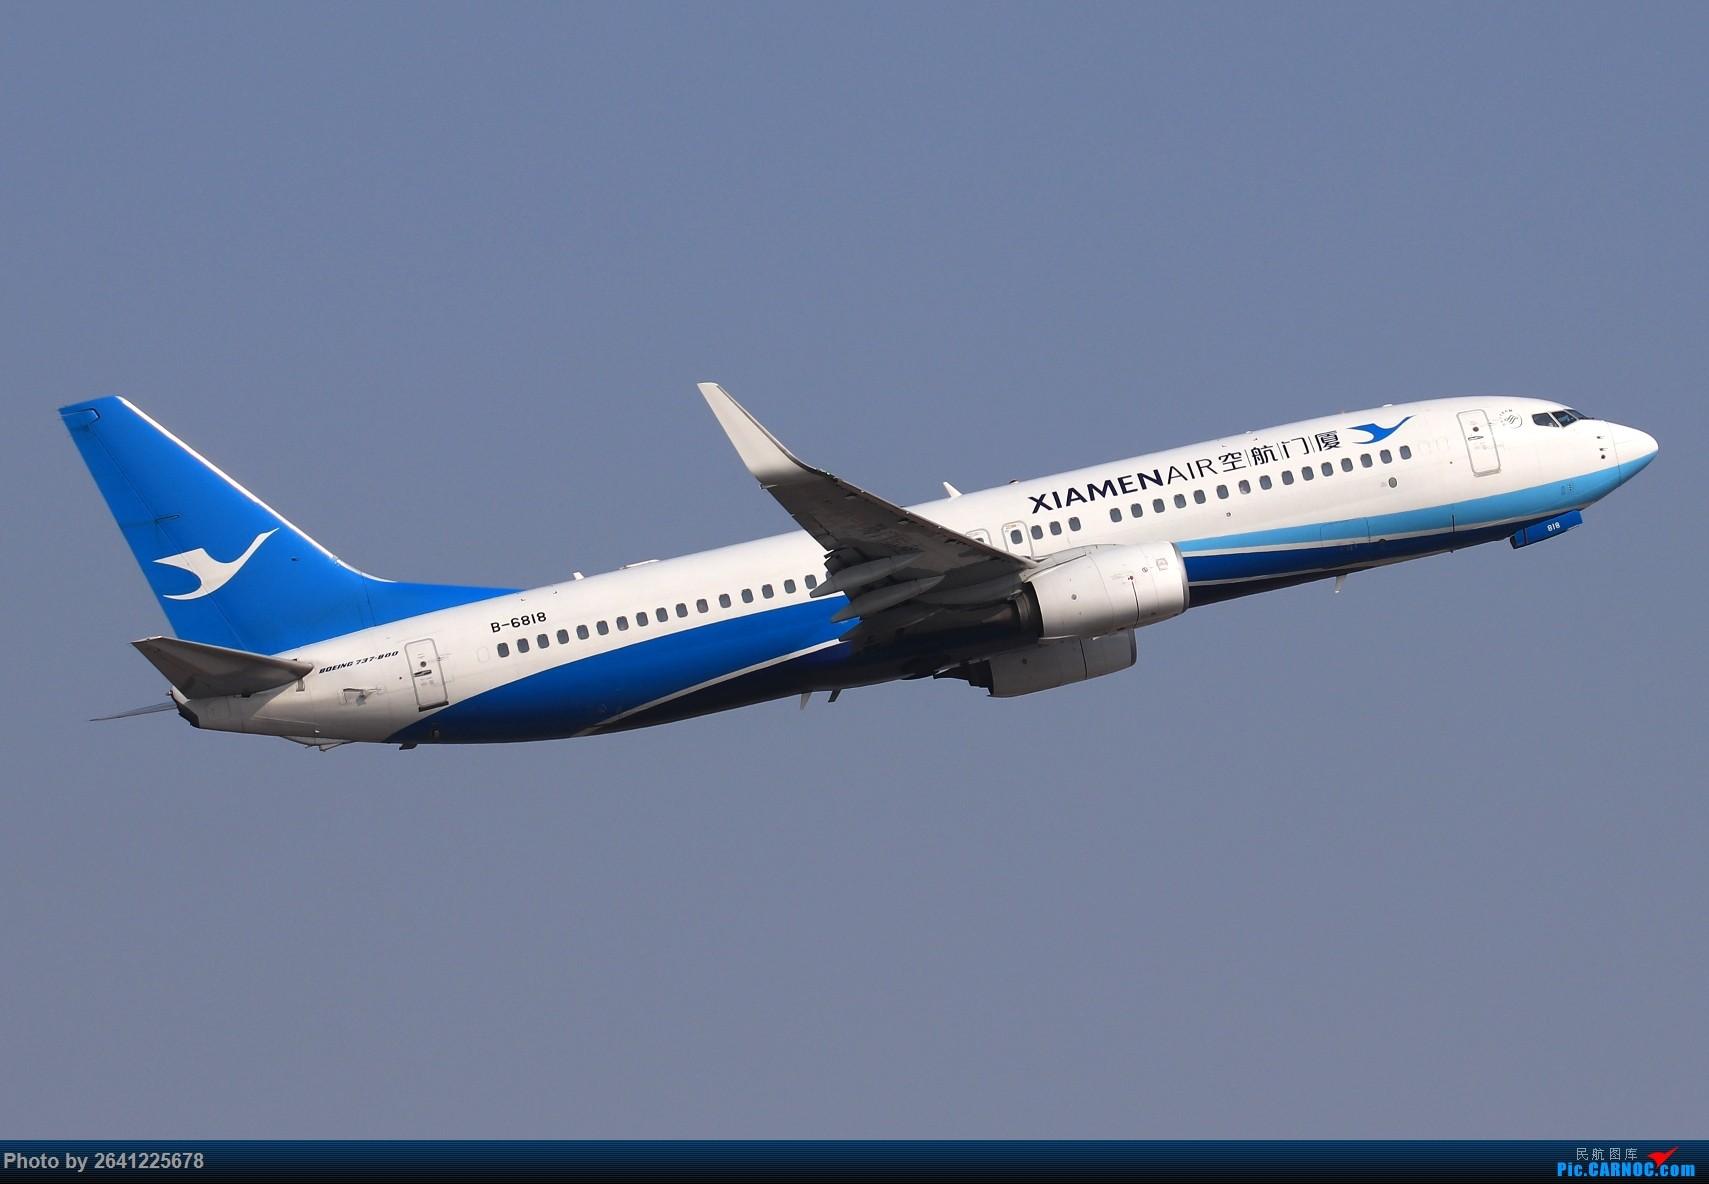 Re:[原创]【TSN】天津滨海国际机场半日游(按注册号1~9发图) BOEING 737-800 B-6818 中国天津滨海国际机场